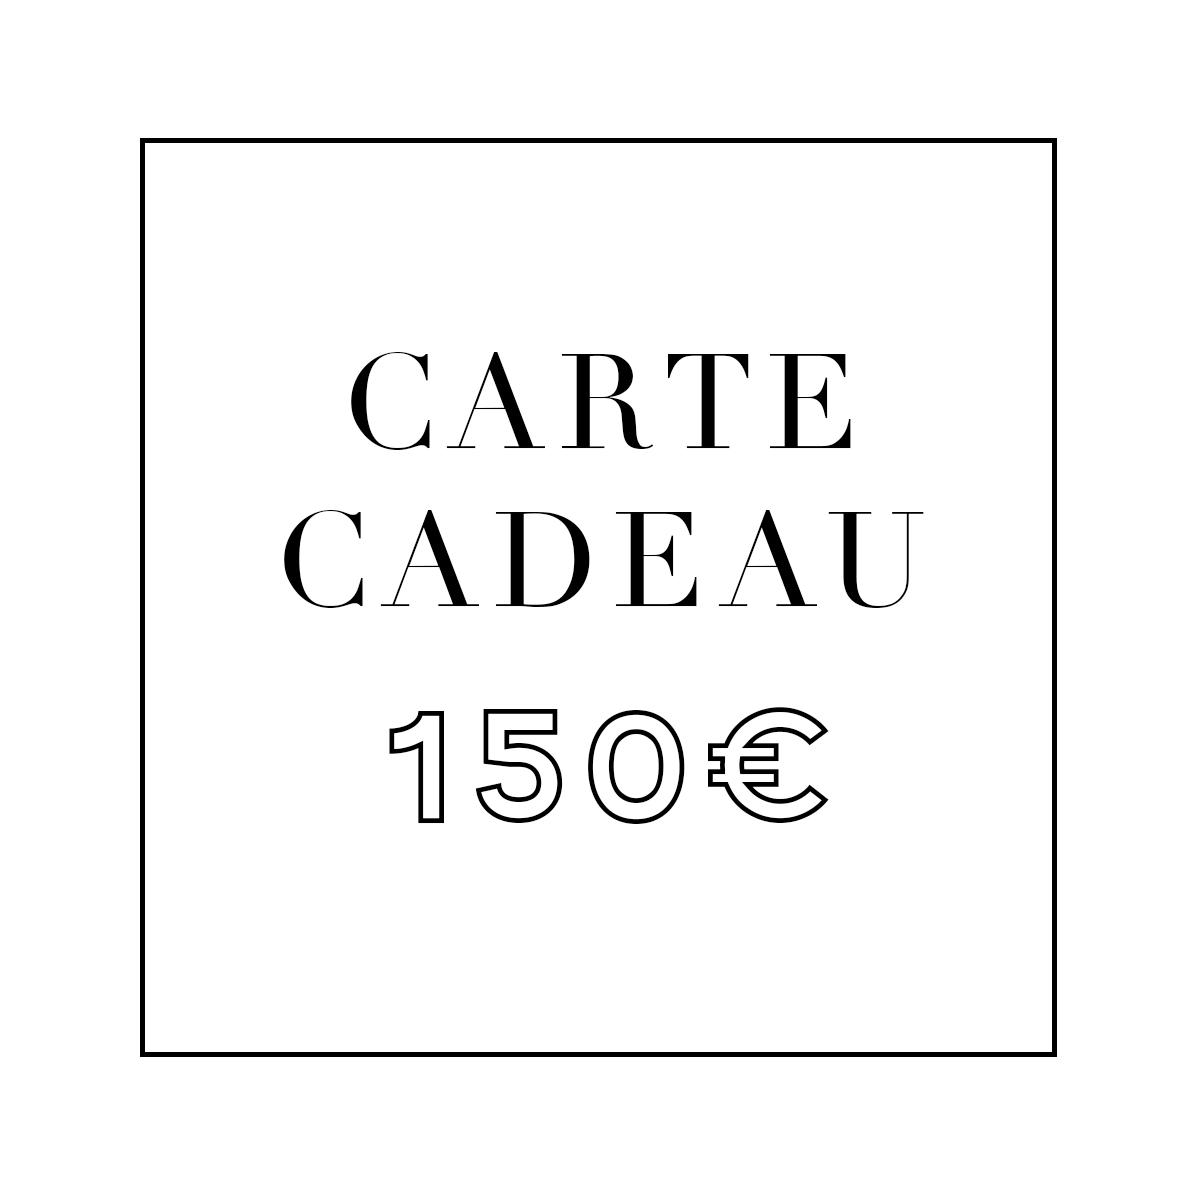 carte-cadeau-internet-150